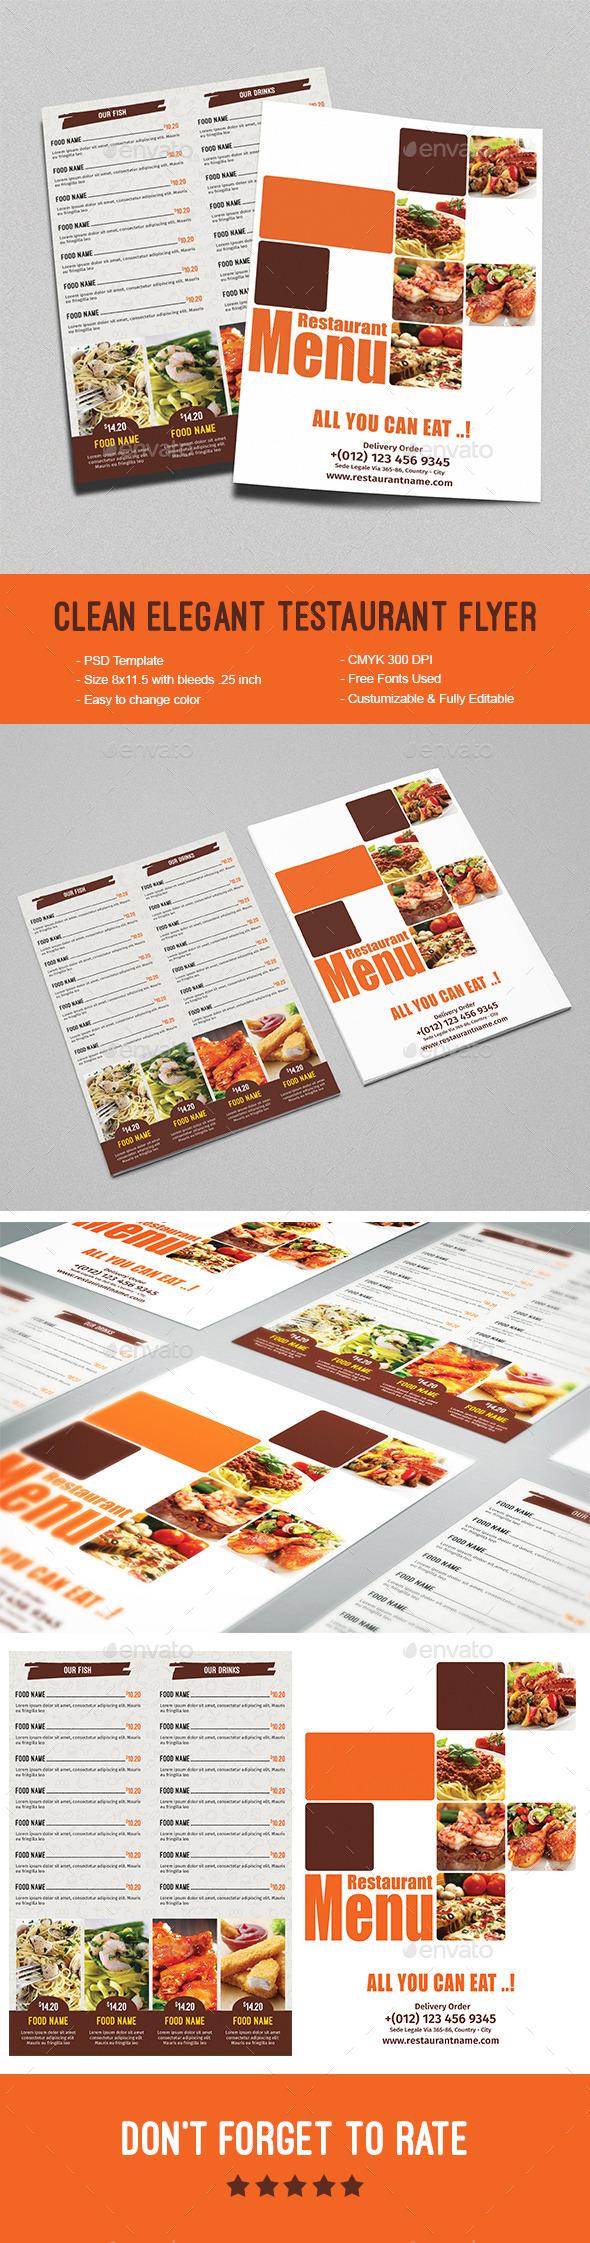 Clean Elegant Restaurant Flyer